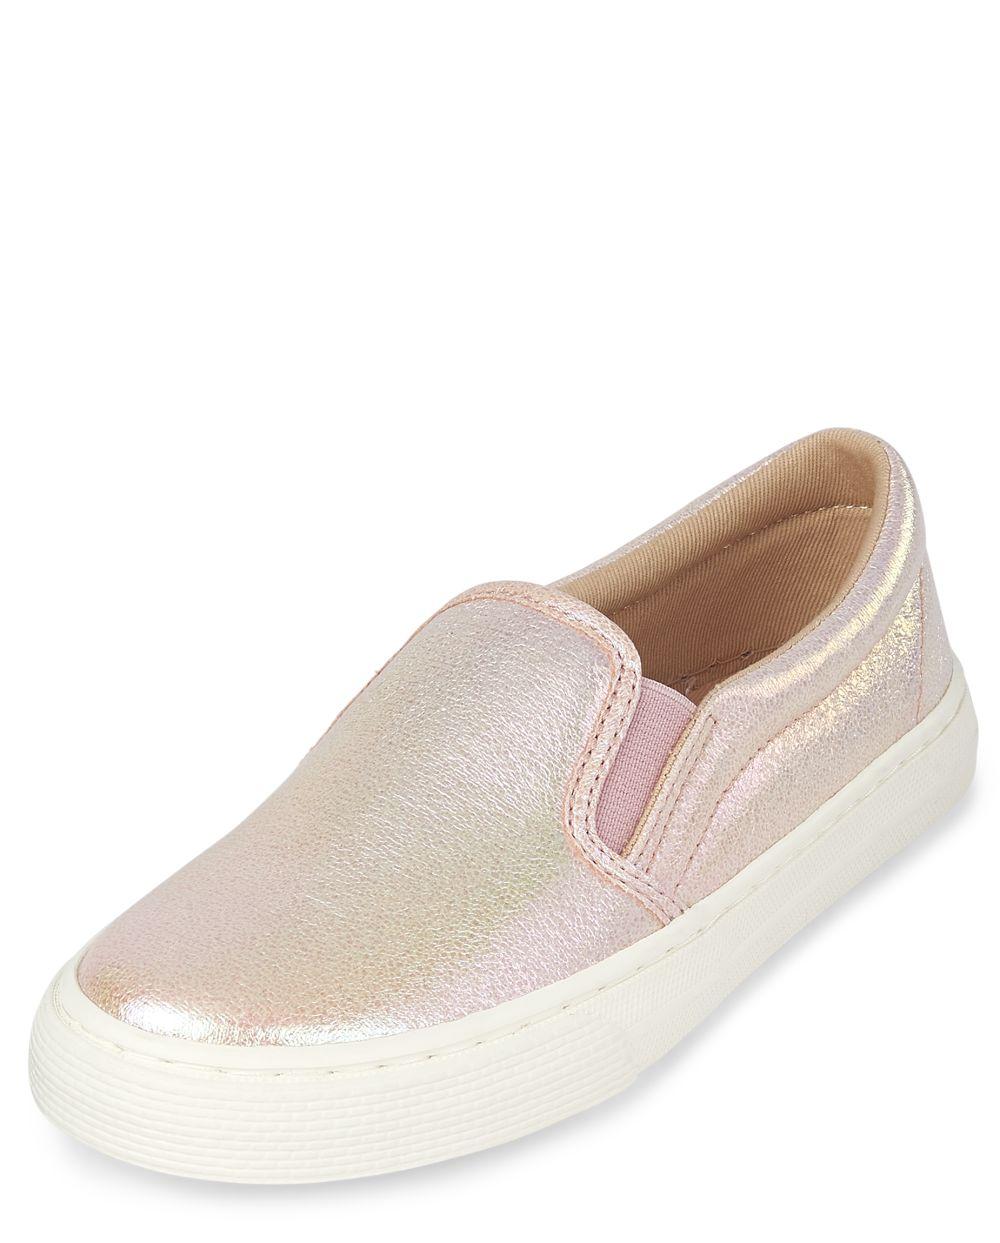 Girls Metallic Slip On Sneakers